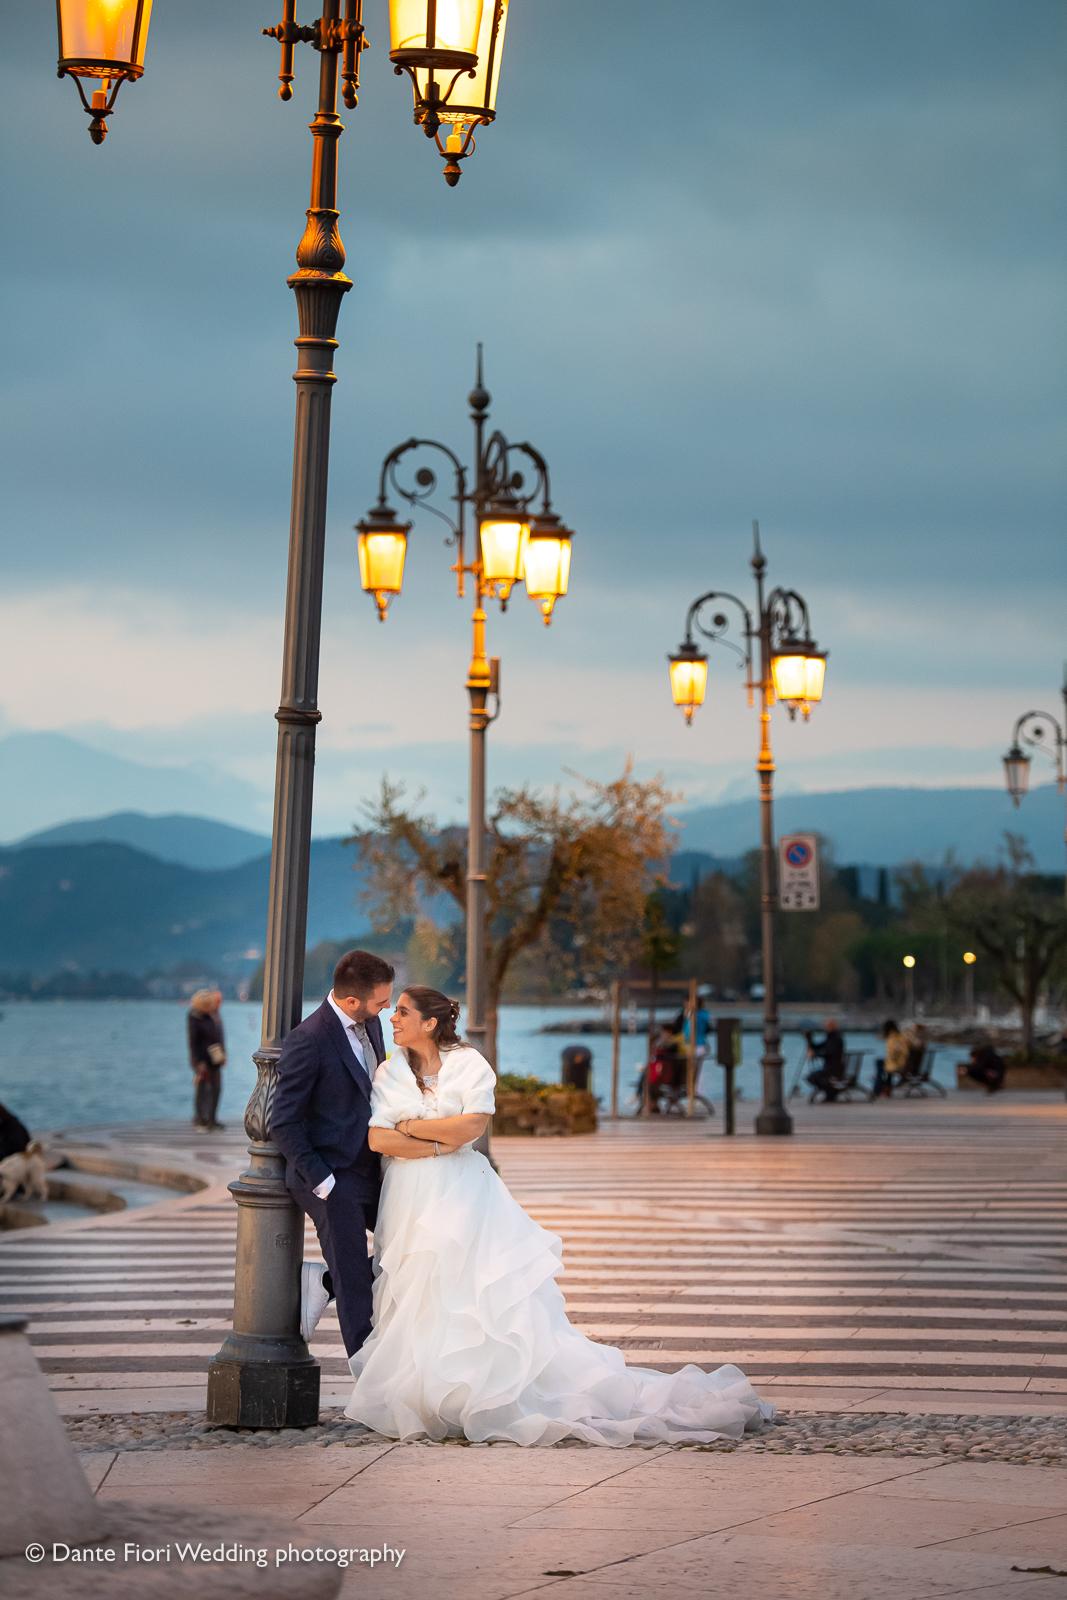 fotografo-matrimonio-vicenza-padova-verona